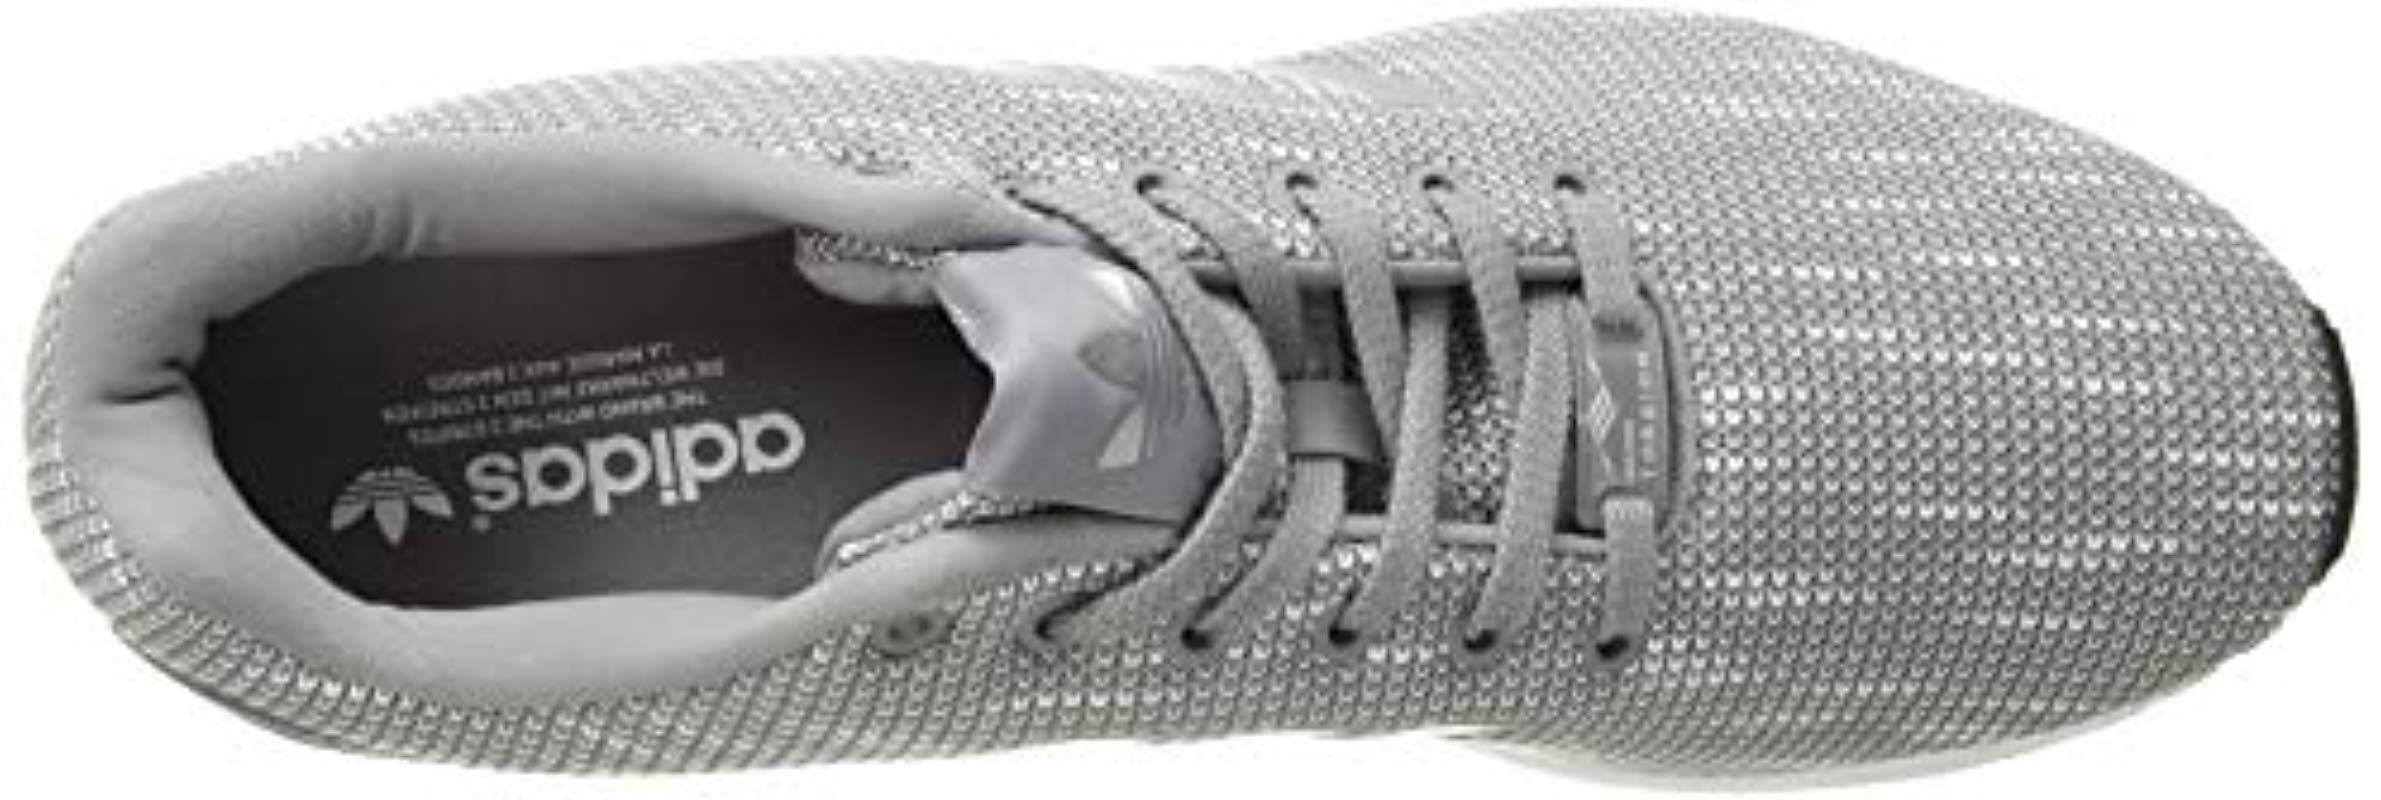 adidas Originals Originals Zx Flux Trainers Aluminum/white in Grey/Grey/White (Grey)